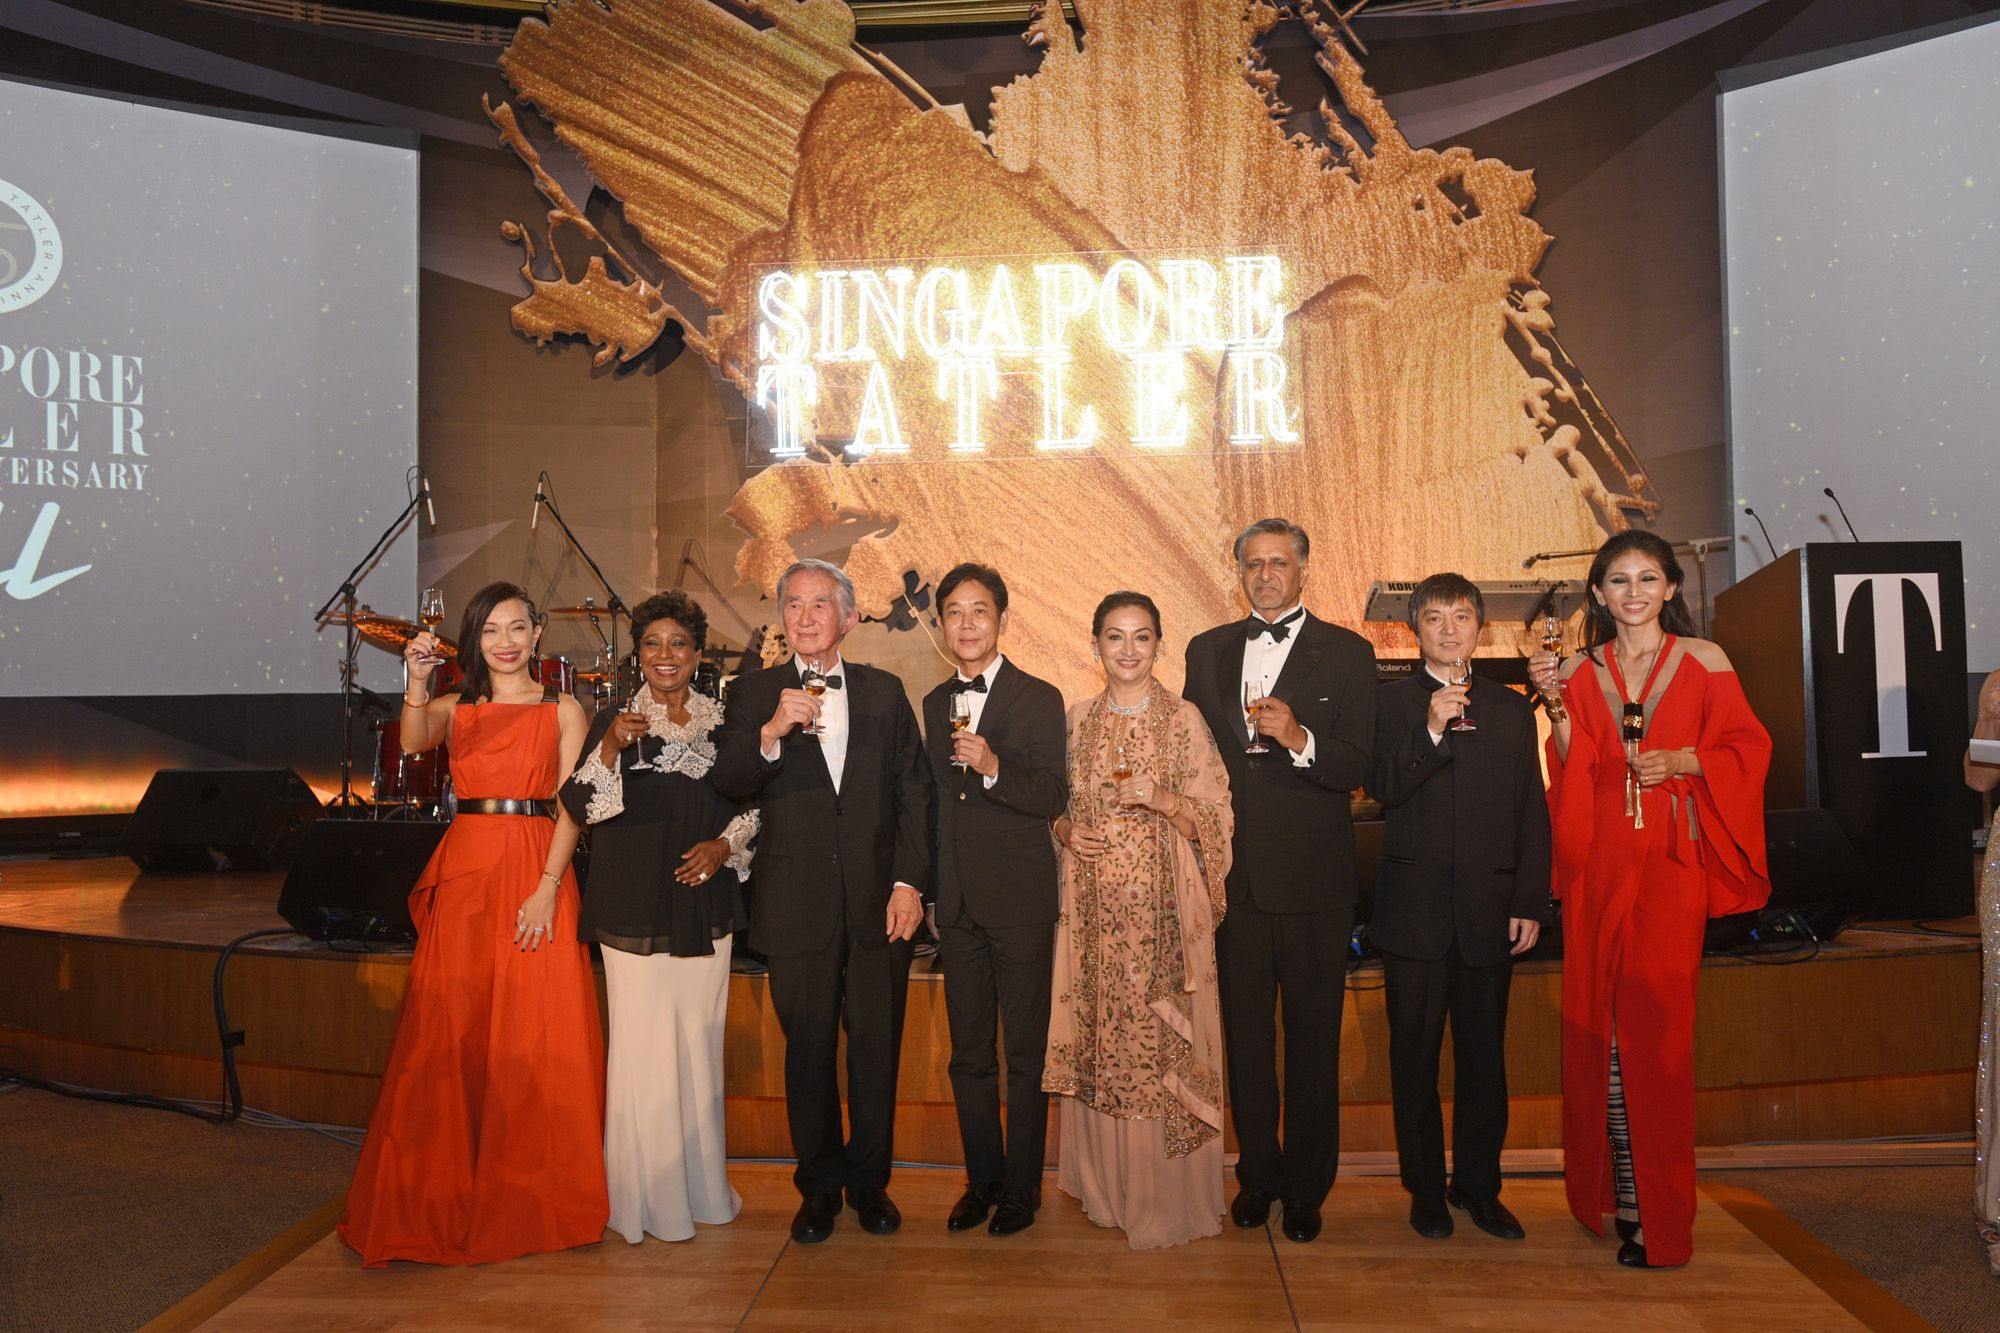 Corinne Ng, Noor Quek, Liu Thai Ker, George Quek, Maniza Jumabhoy, Iqbal Jumabhoy, Lan Shui, Karen Ong-Tan